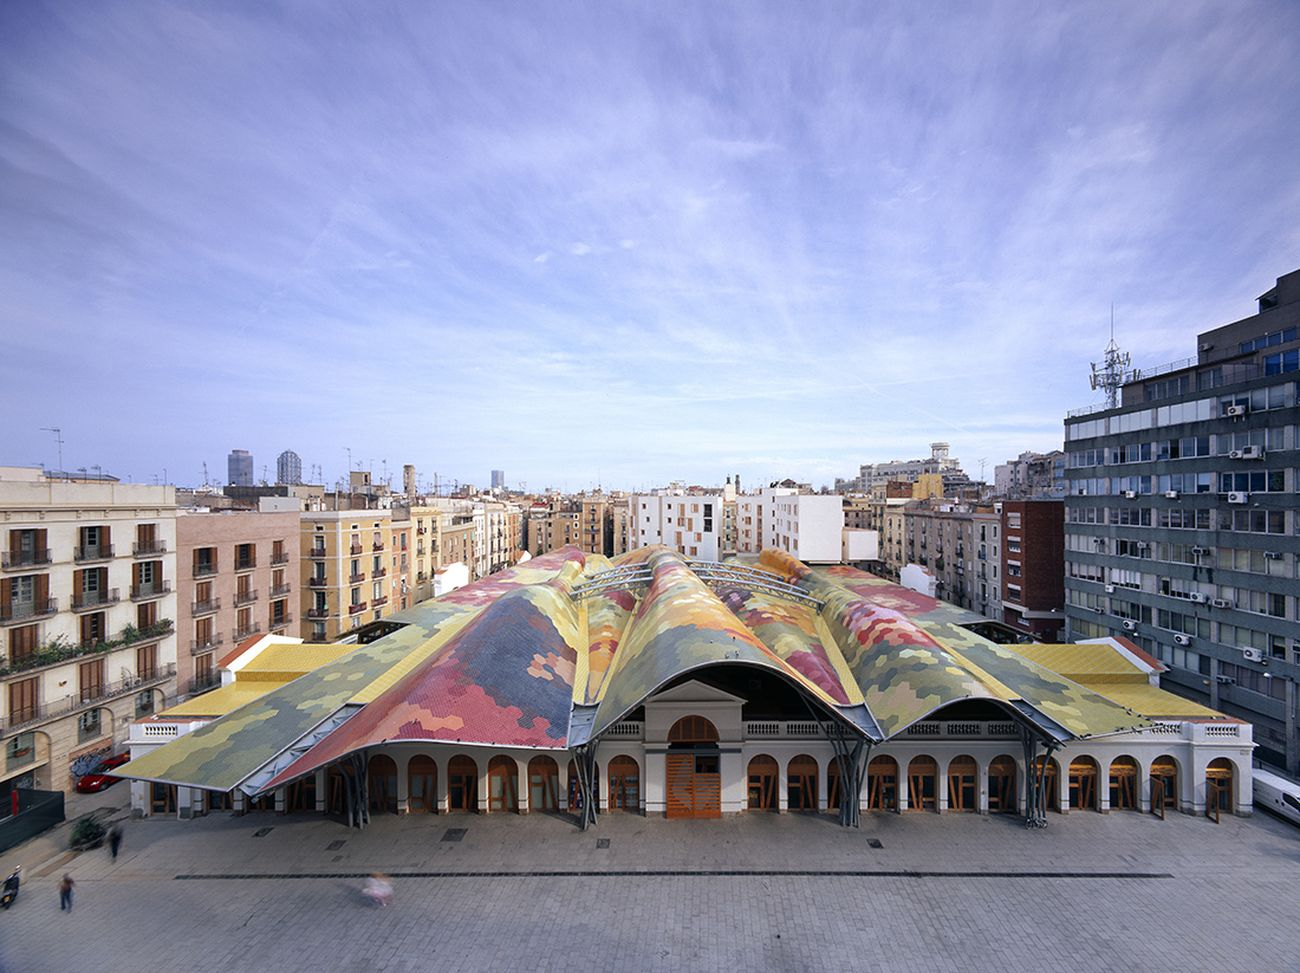 Santa Caterina Market, Barcellona, Spagna. 2005. Photo Roland Halbe. Courtesy studio EMBT